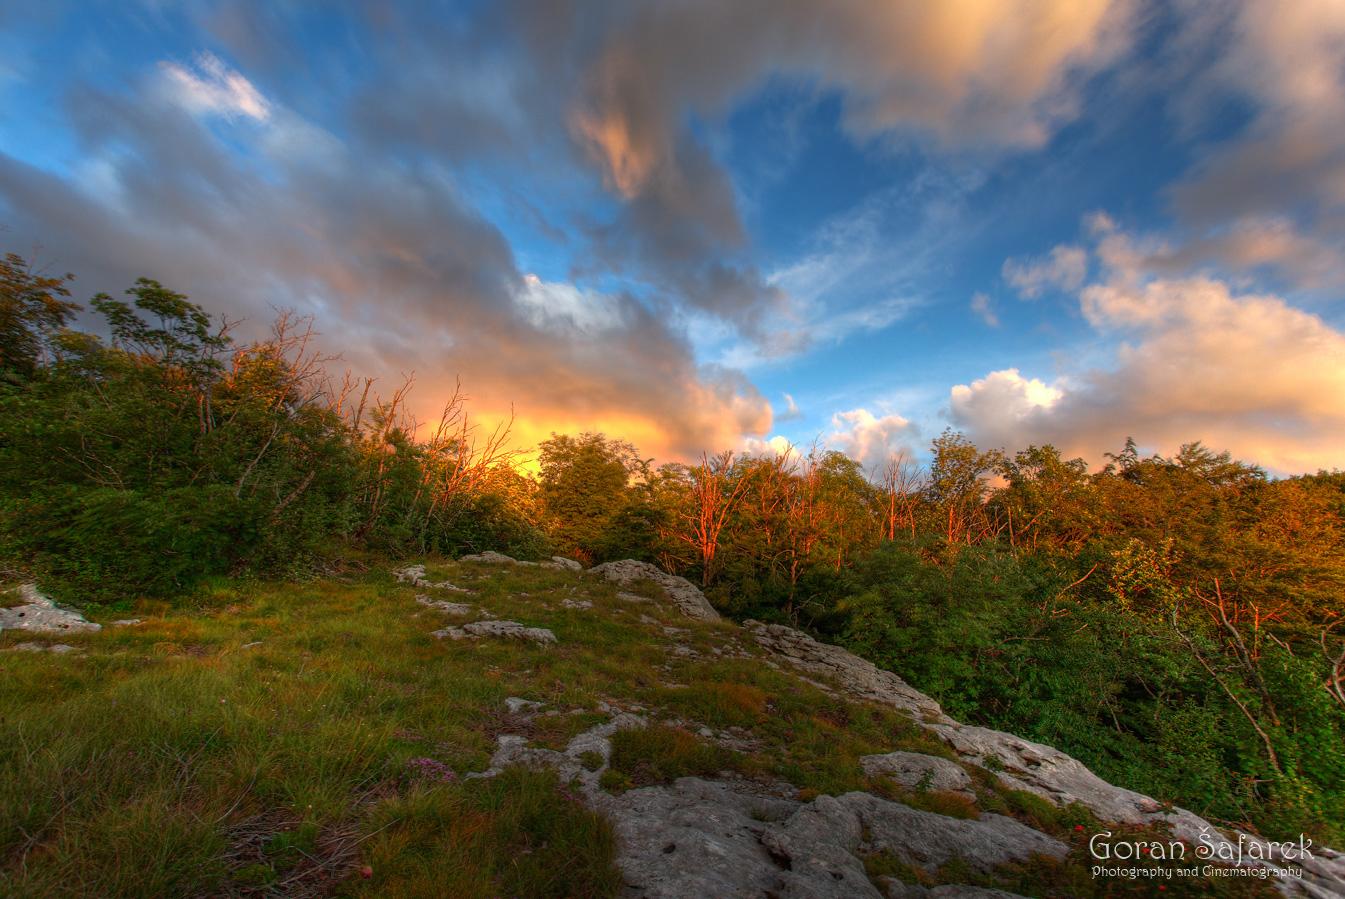 croatia, velebit, lika, mountain, national park, nature park, sunset